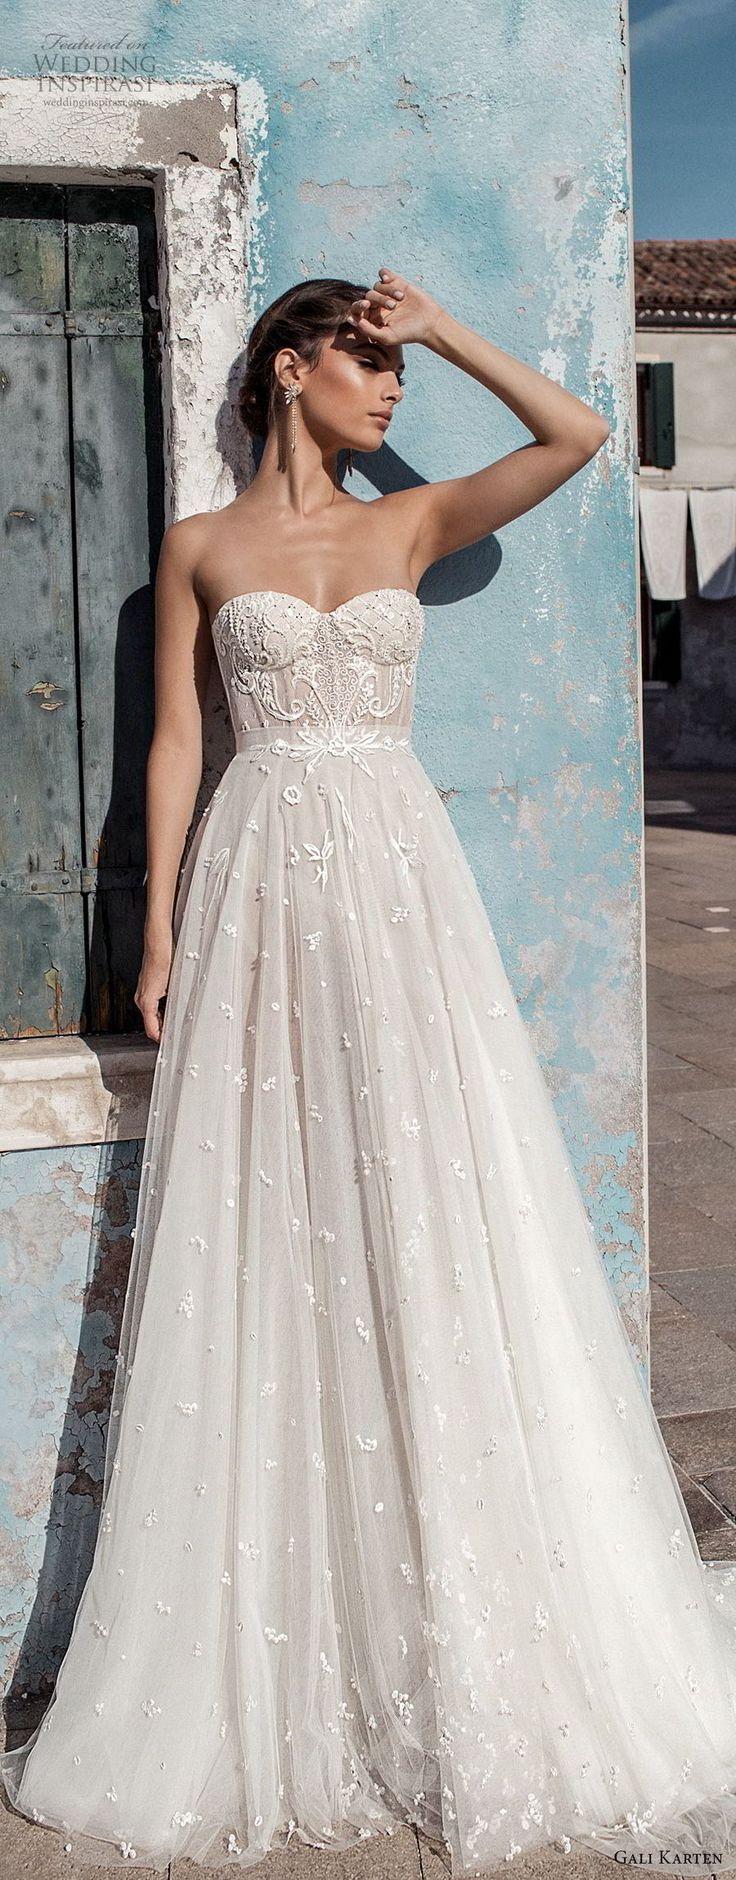 gali karten 2018 bridal strapless sweetheart neckline heavily embellished bodice bustier romantic soft a line wedding dress medium train #beach #wedding #weddingdress